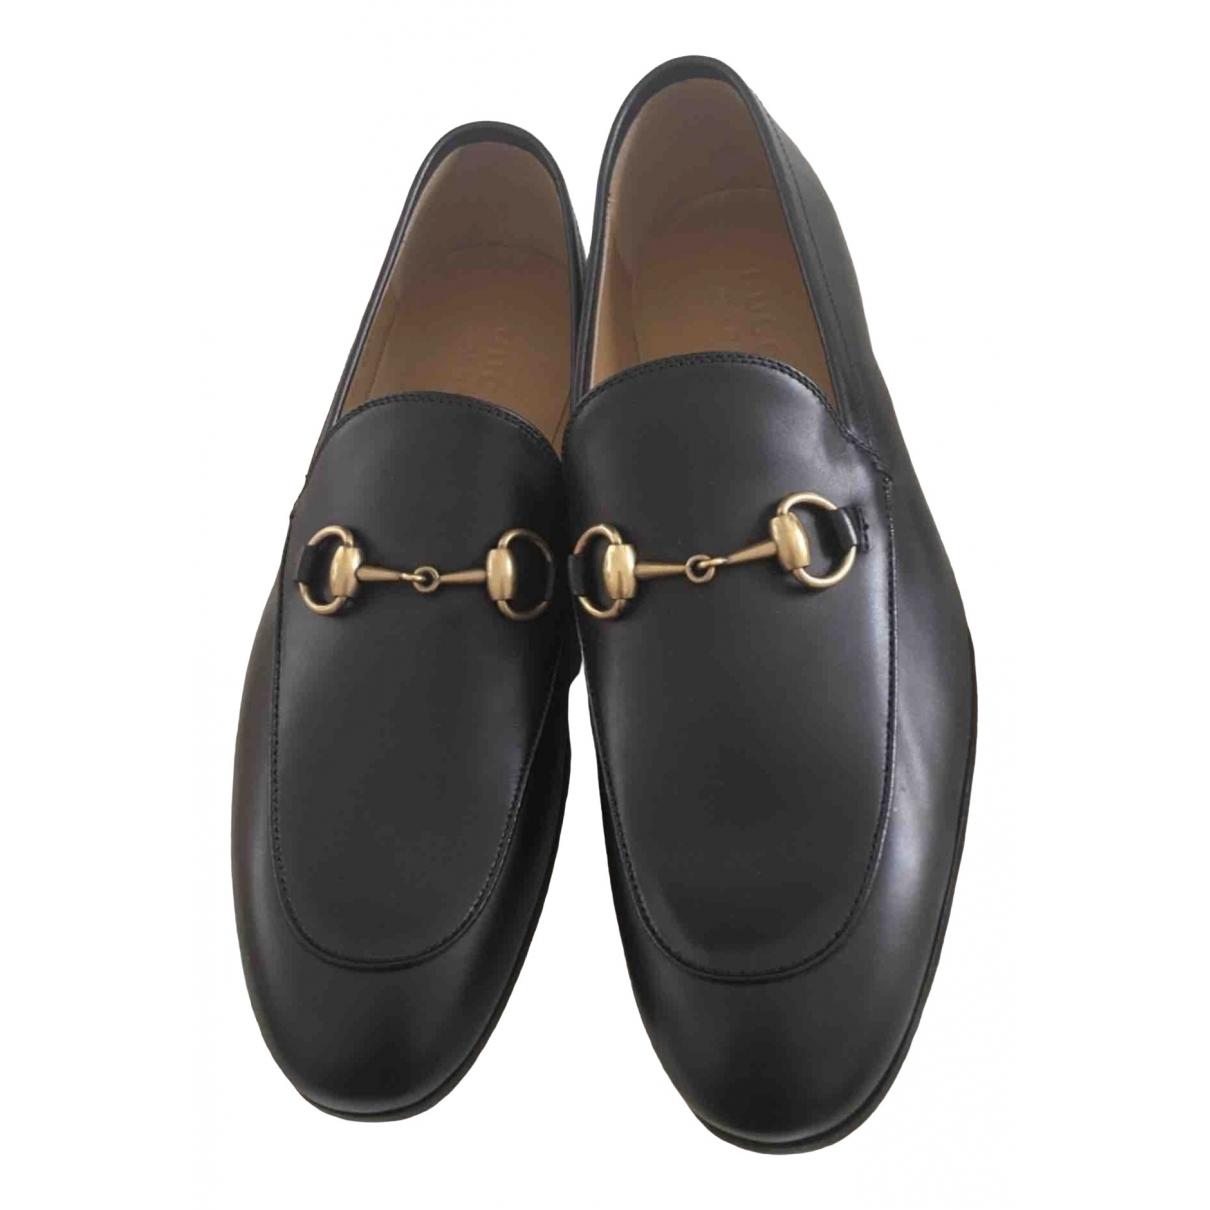 Gucci Jordaan Black Leather Flats for Men 7 US